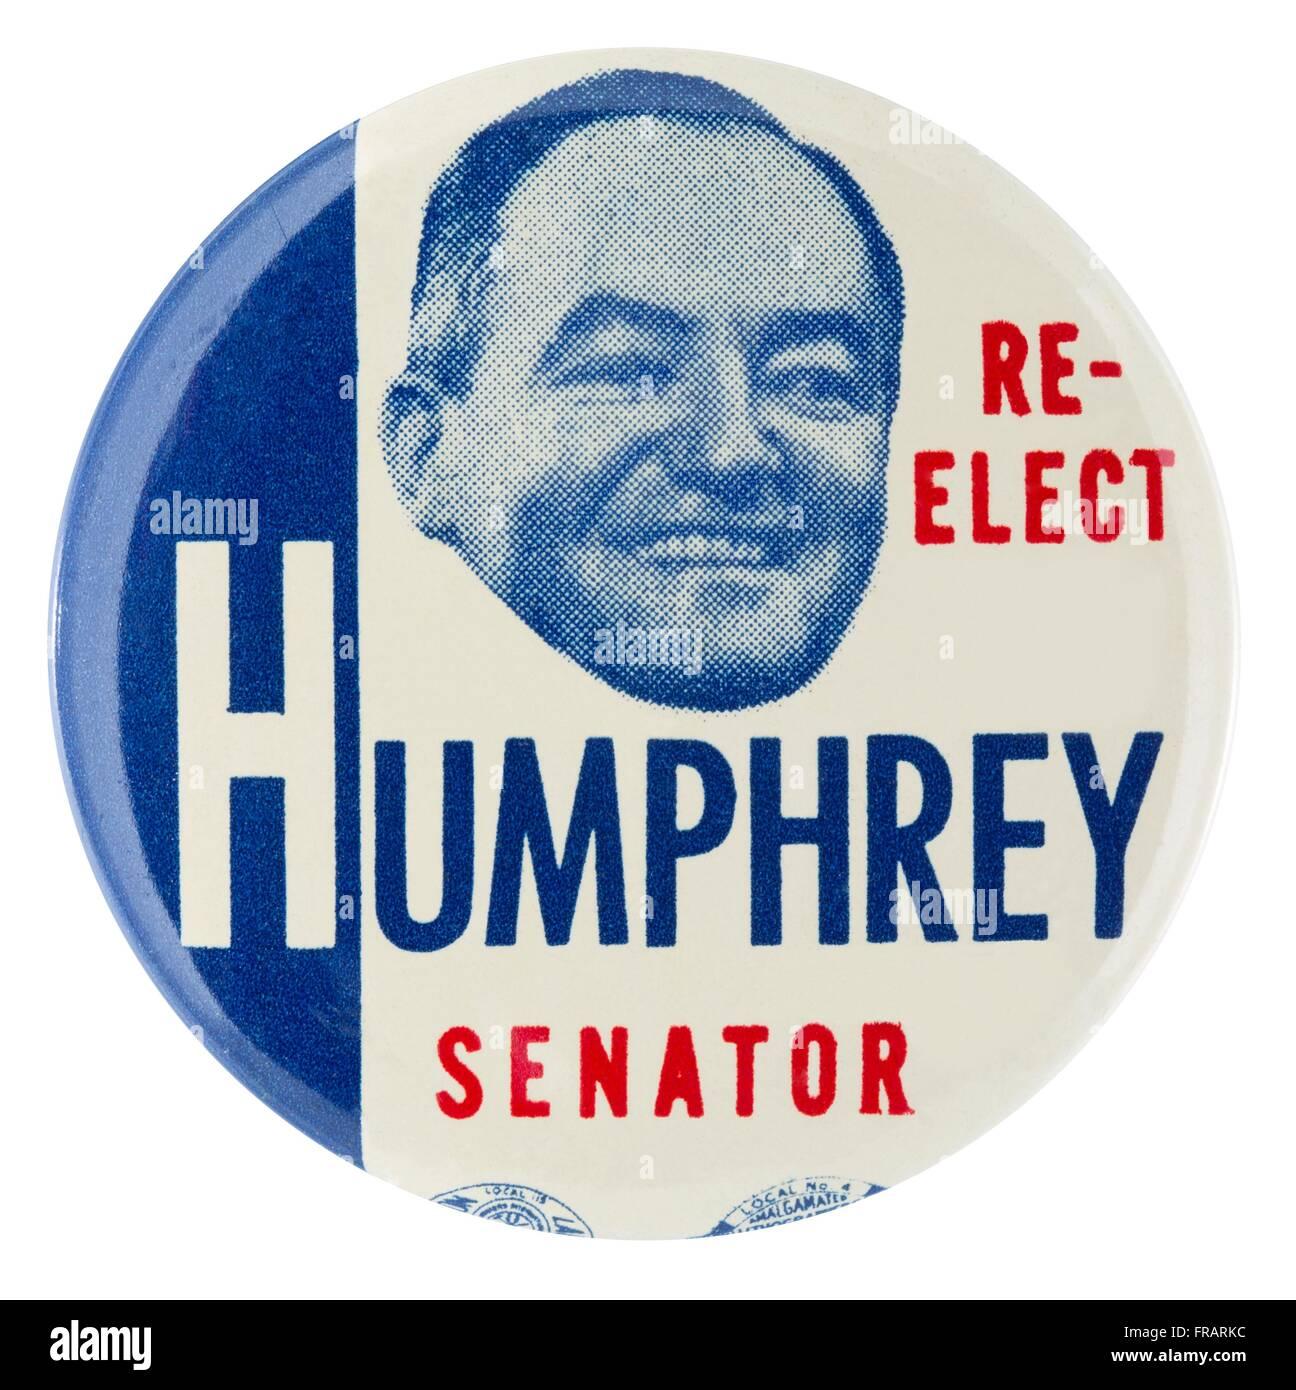 1954 Re-Elect Hubert H. Humphrey Senator Pinback Button - Stock Image